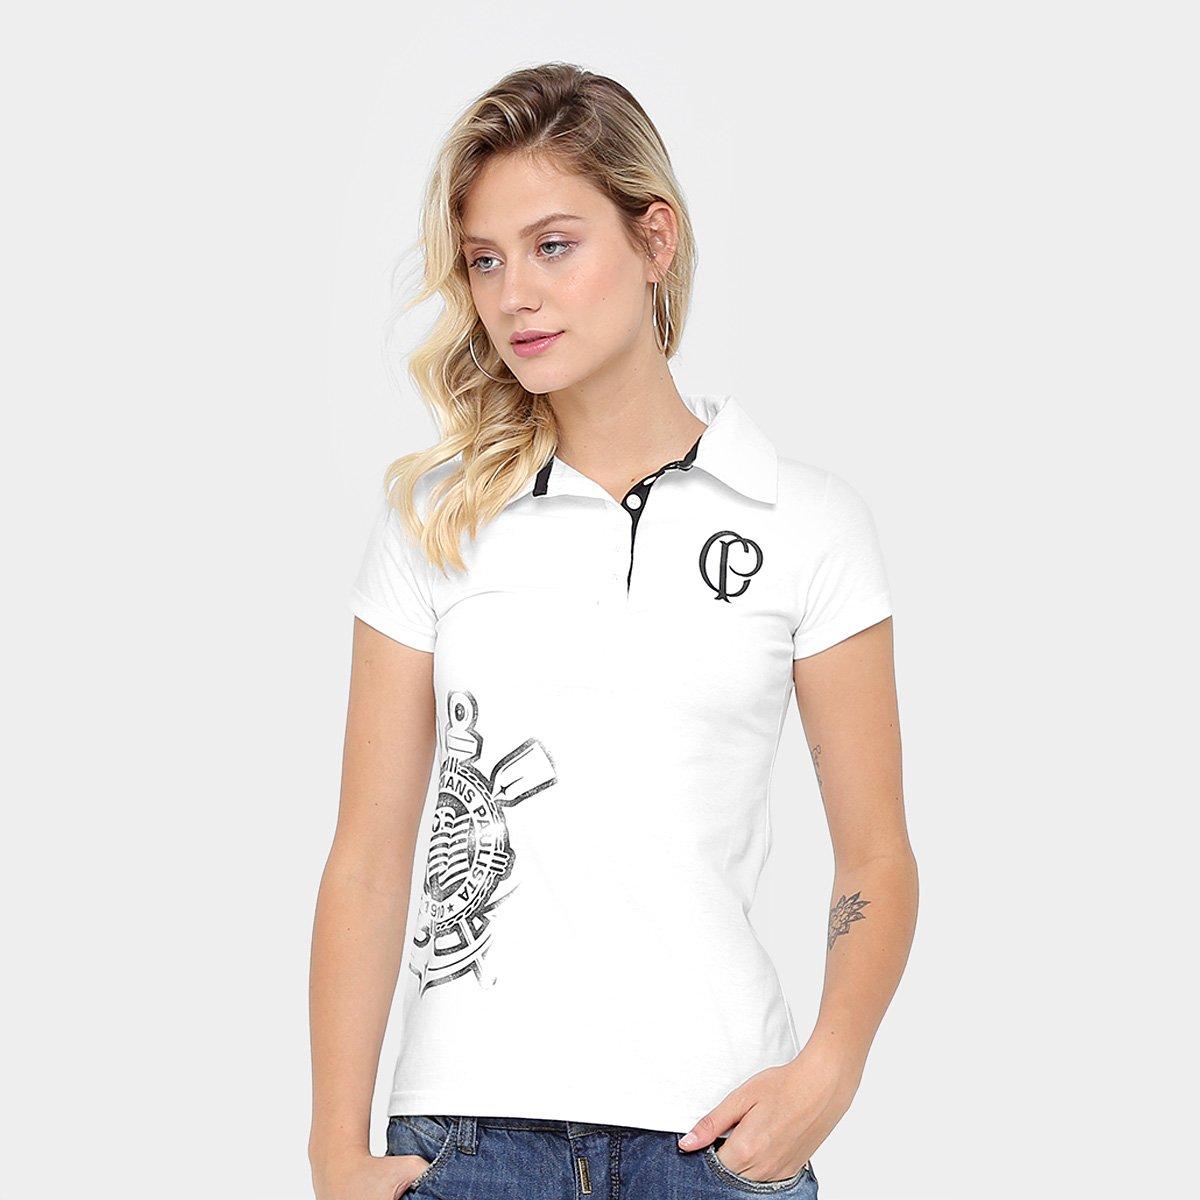 Camisa Polo Corinthians Feminina - Compre Agora  caabc5e6ca7e0